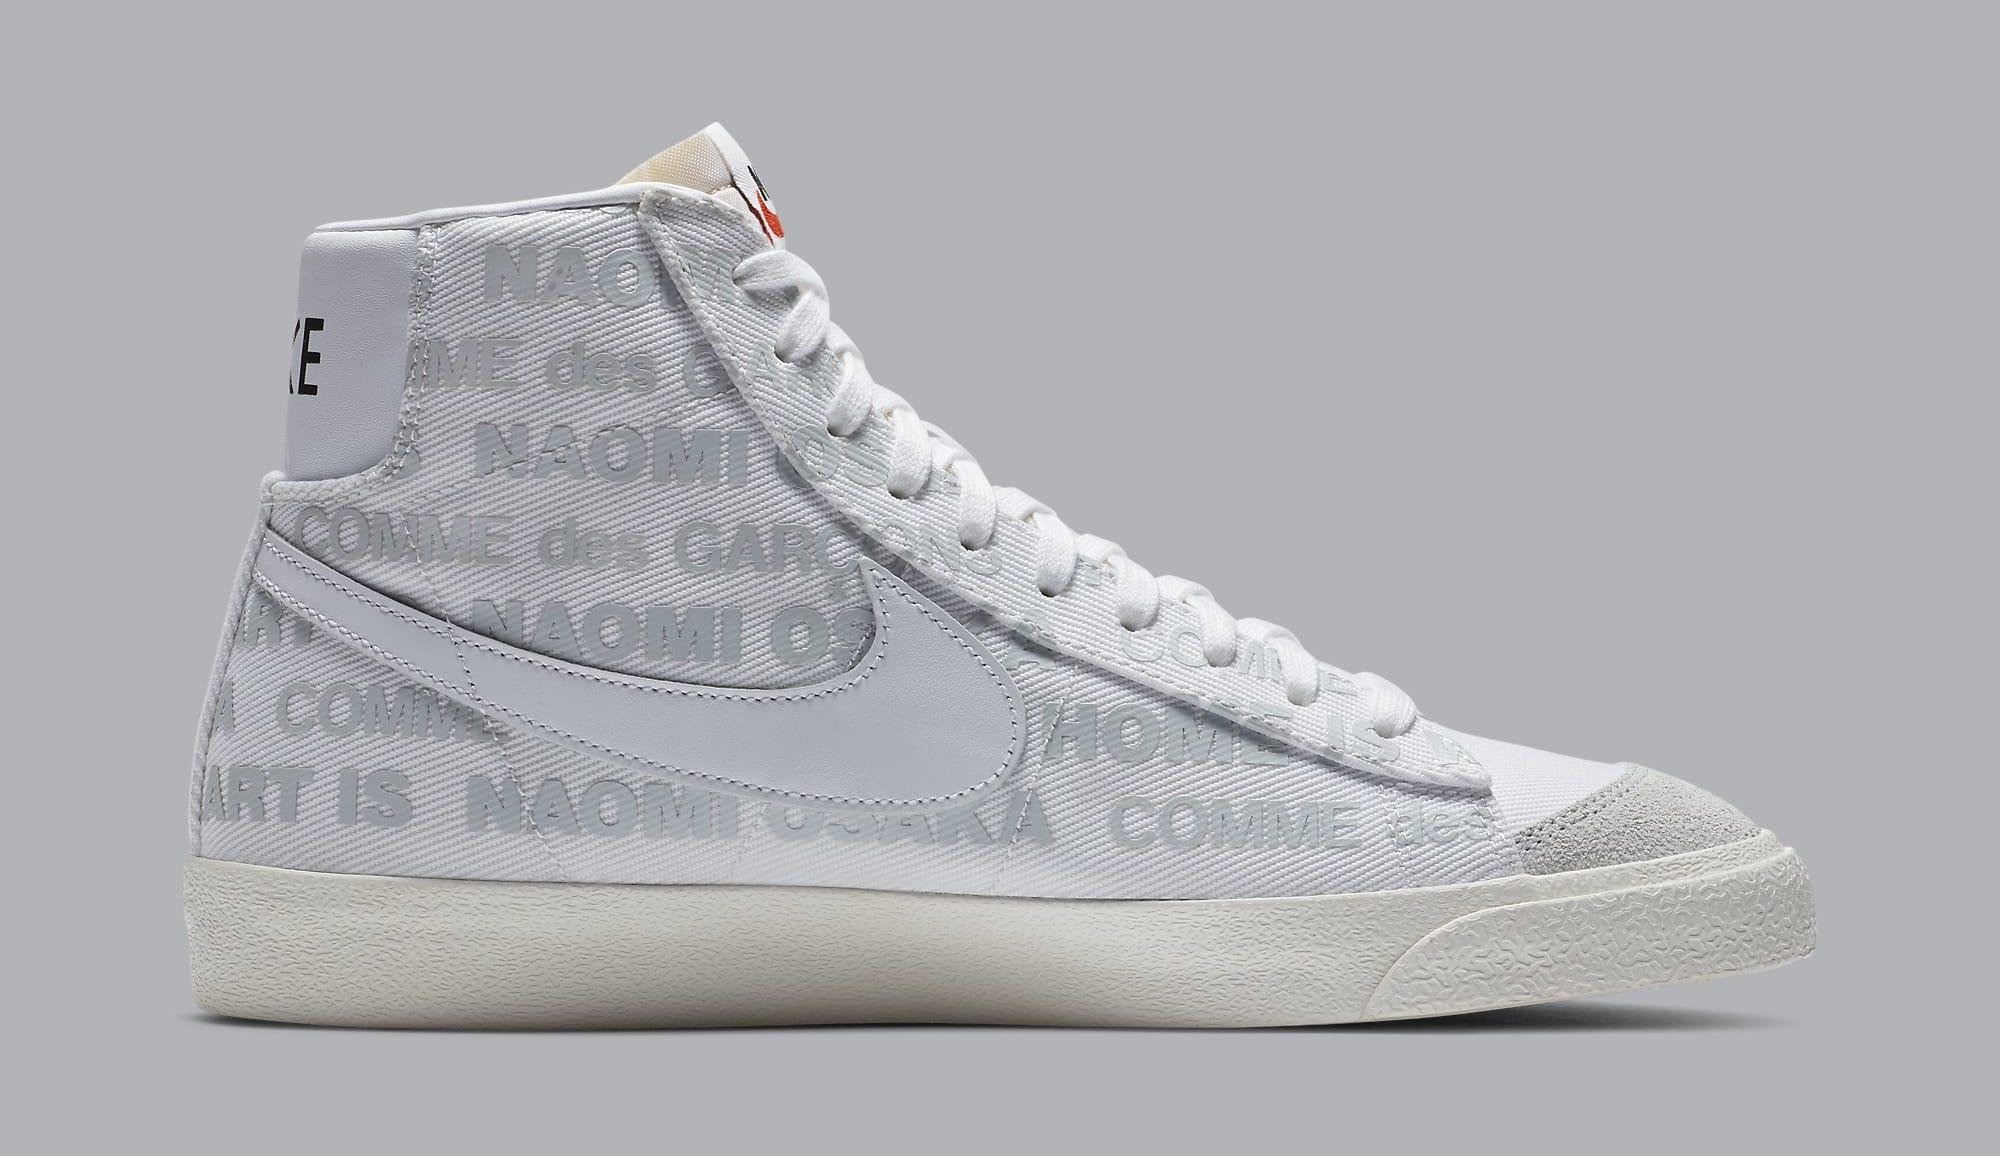 Comme des Garcons x Naomi Osaka x Nike Blazer Mid DA5383-100 Medial